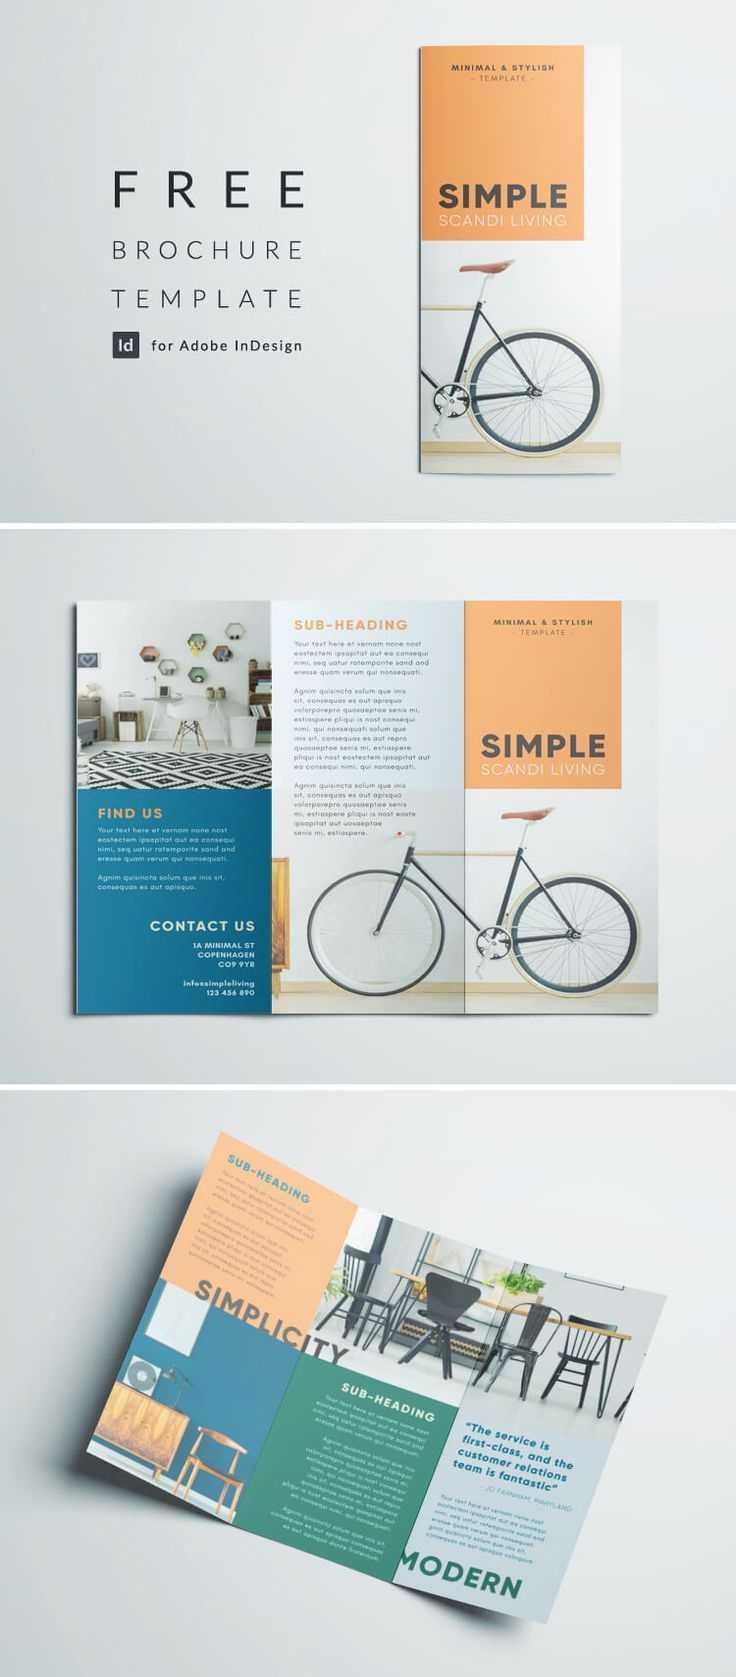 Simple Tri Fold Brochure | Indesign Brochure Templates With Regard To Adobe Indesign Tri Fold Brochure Template